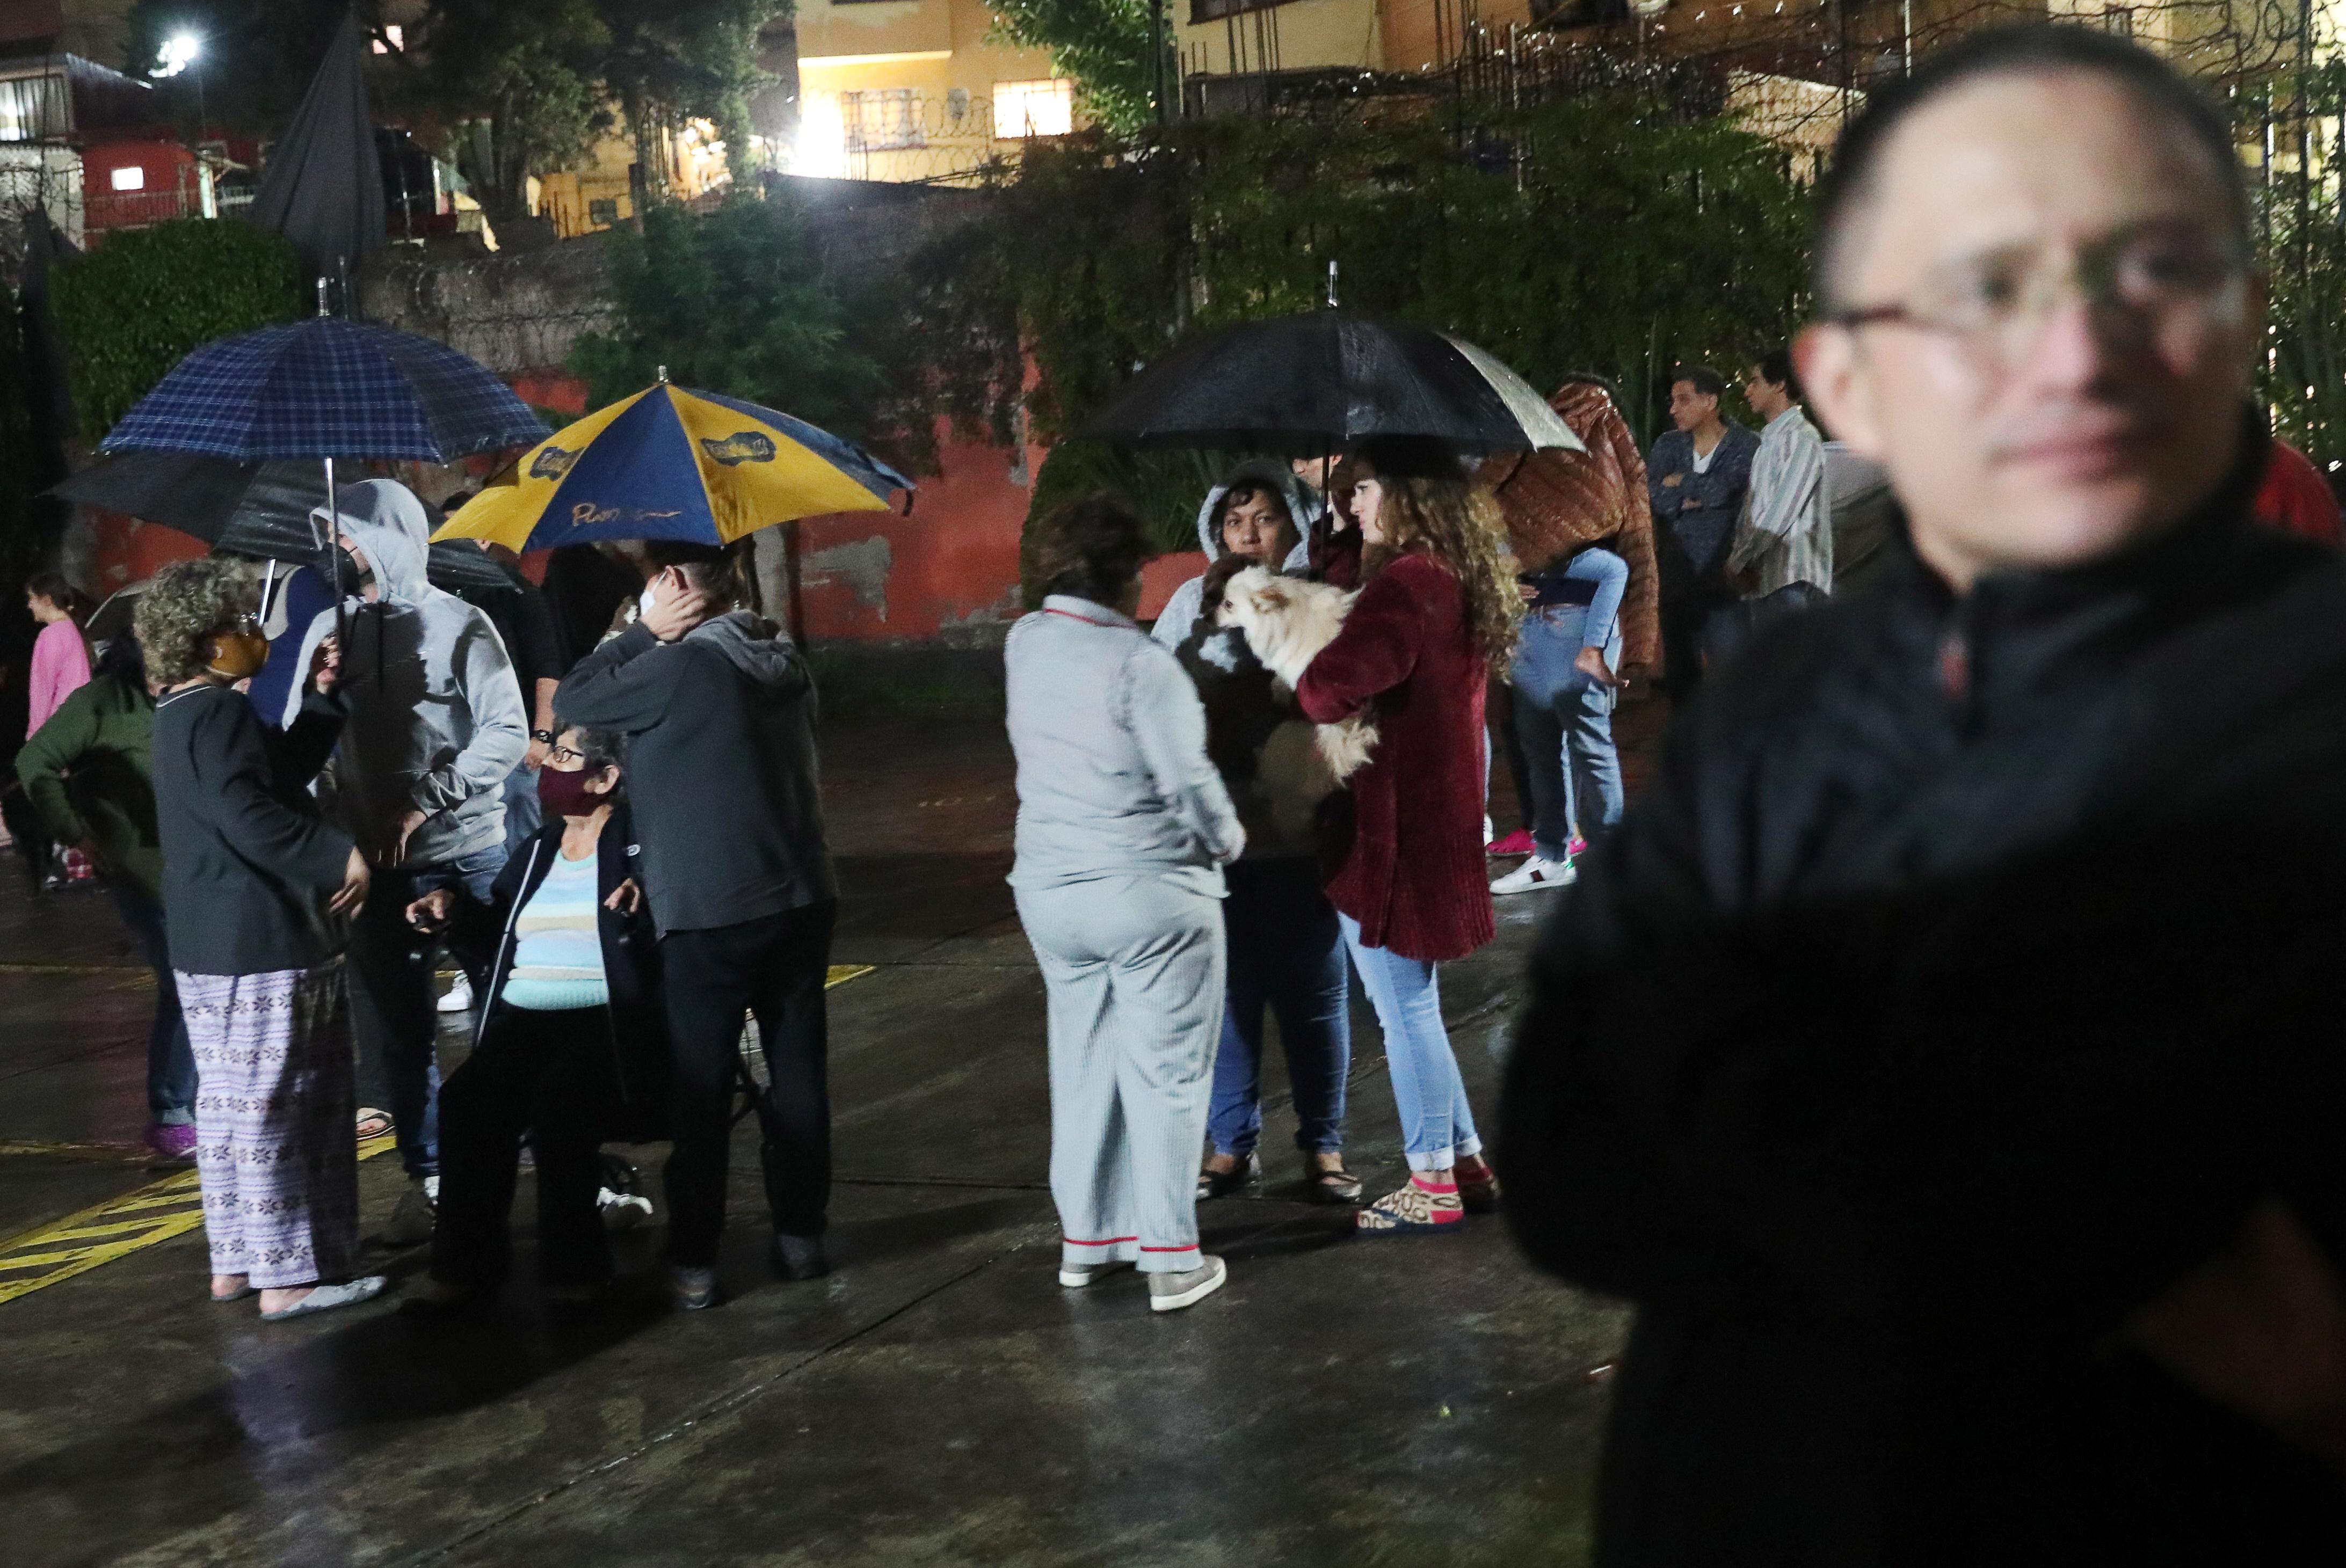 People react during a quake in Mexico City, Mexico, September 7, 2021. REUTERS/Edgard Garrido